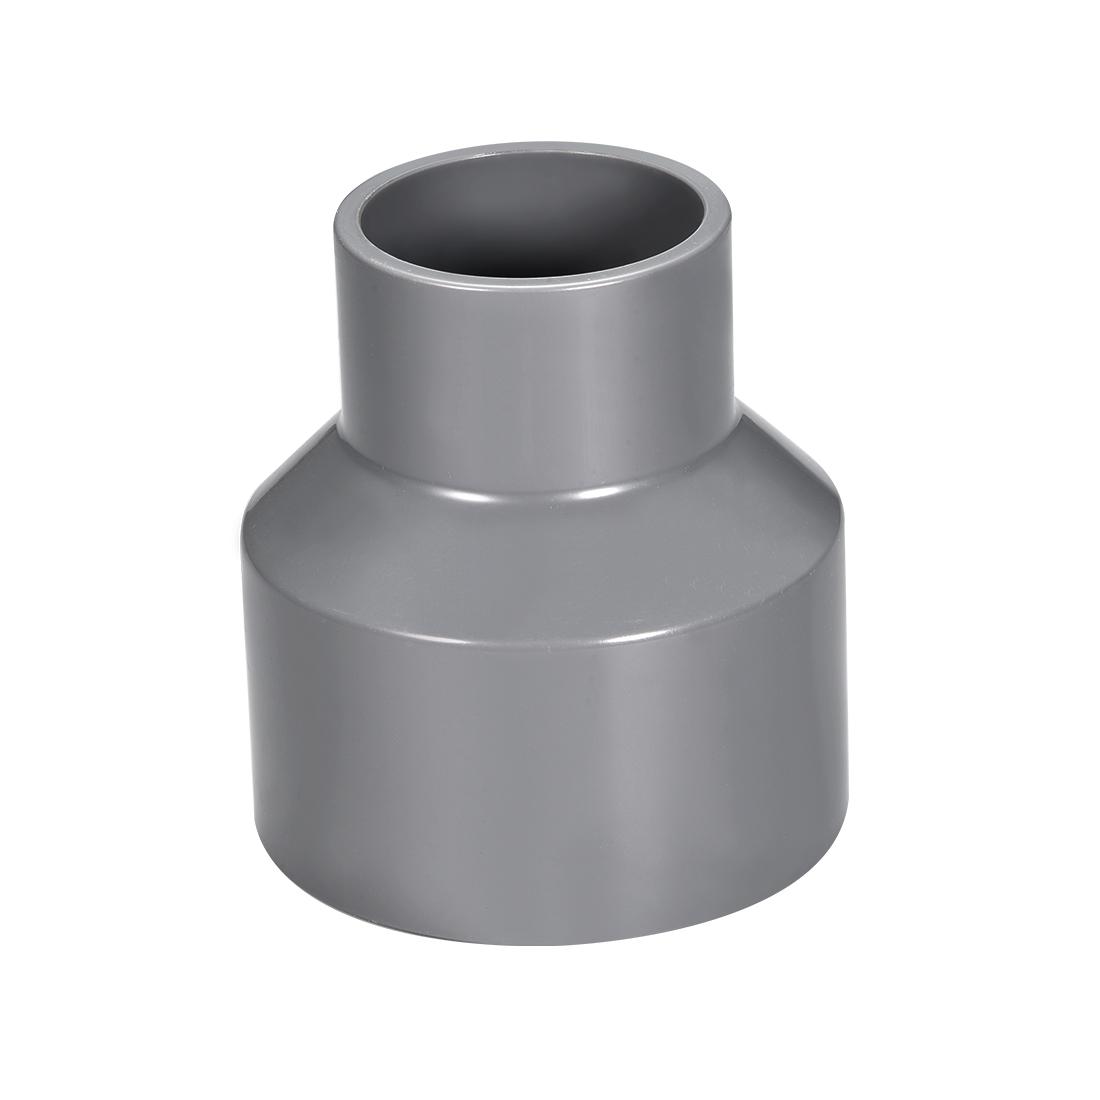 63mm x 40mm PVC Reducing Coupling Hub by Hub, DWV Pipe Fittings Gray